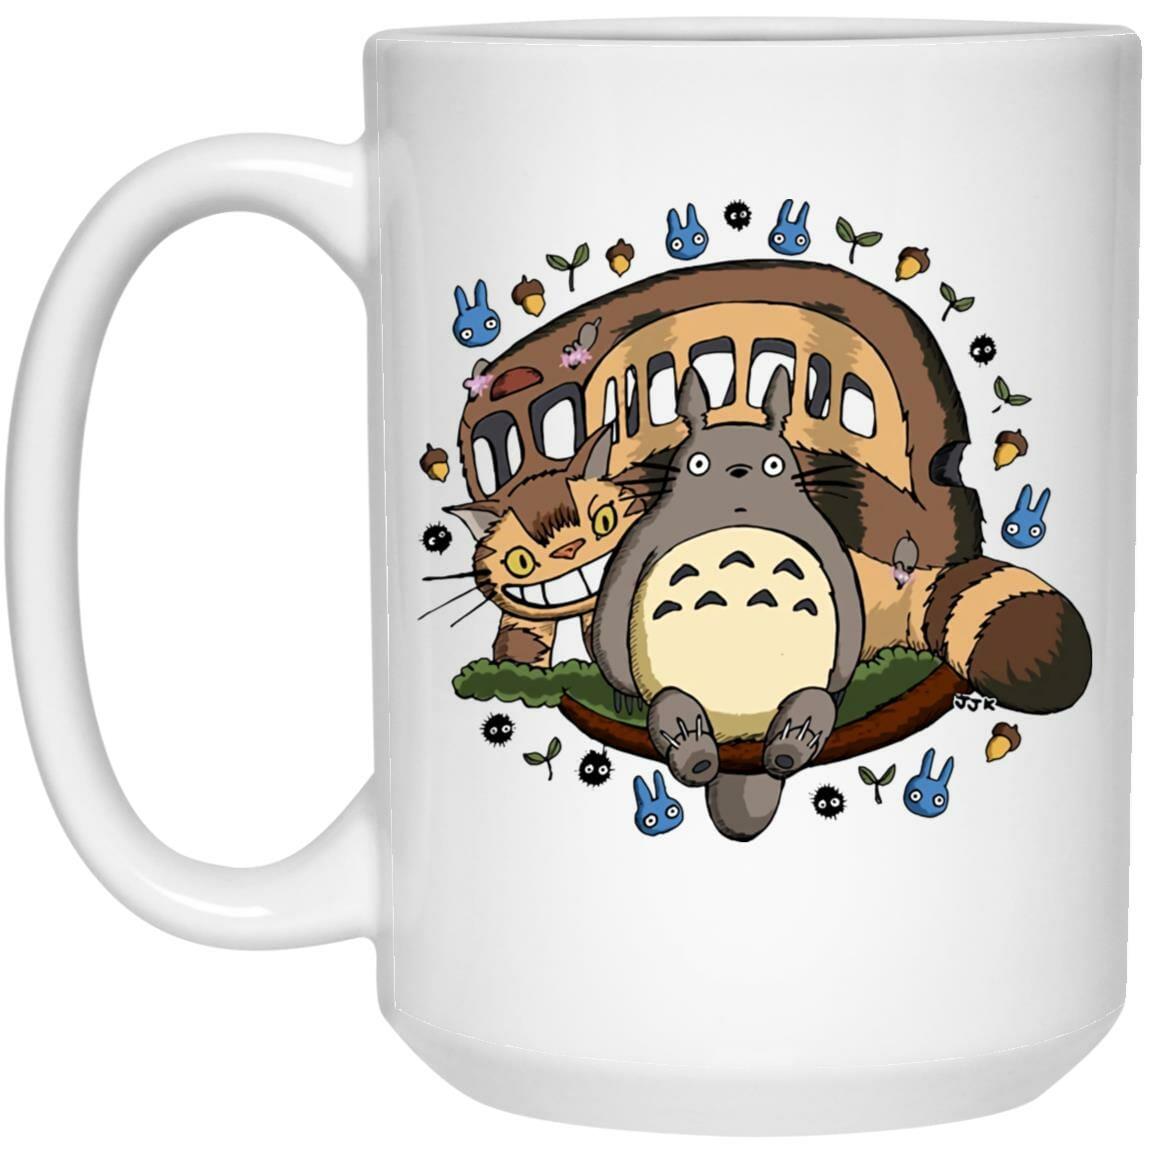 Totoro and the Catbus Mug